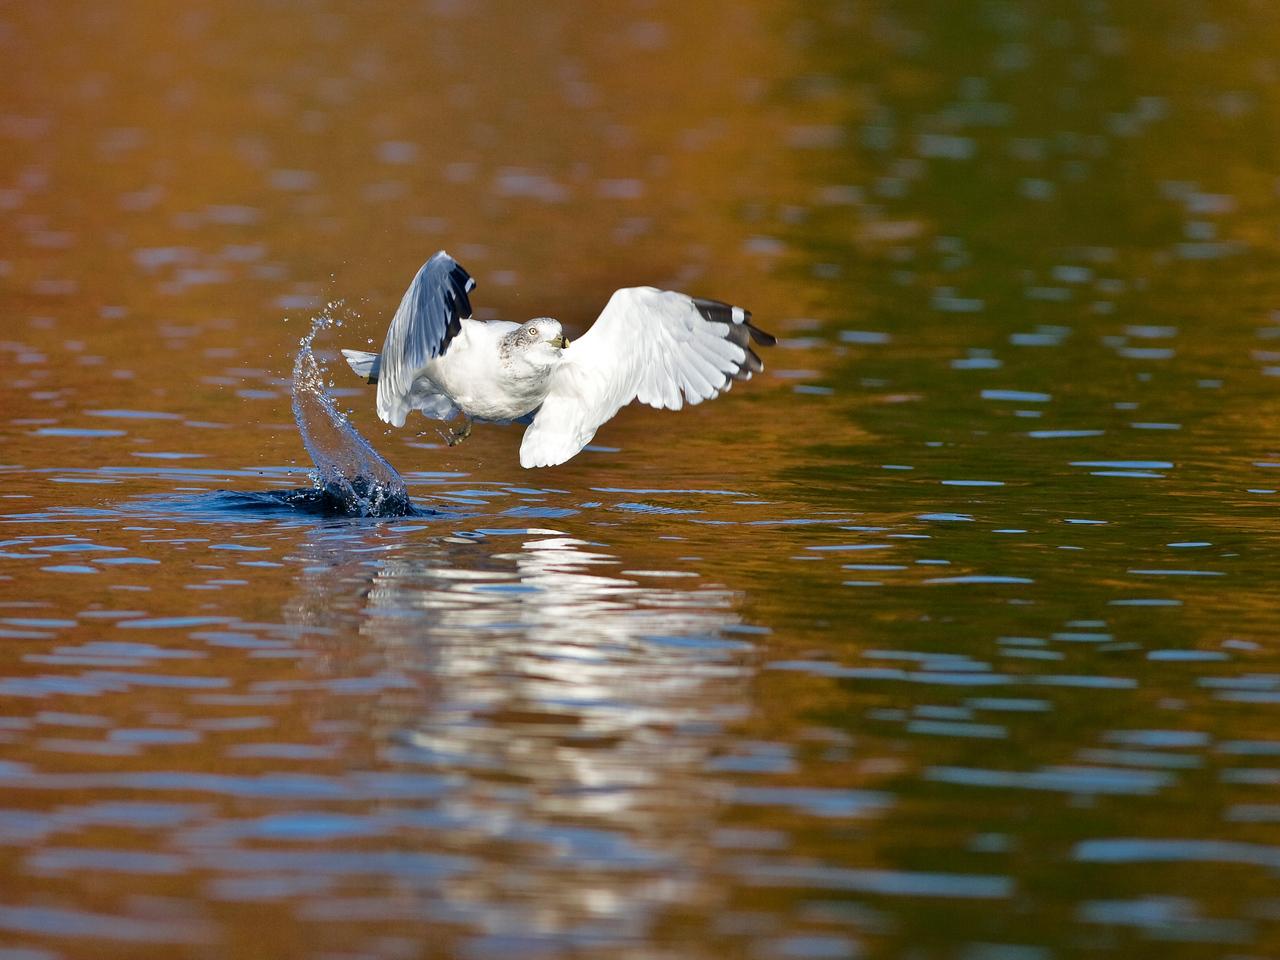 Gull emerging